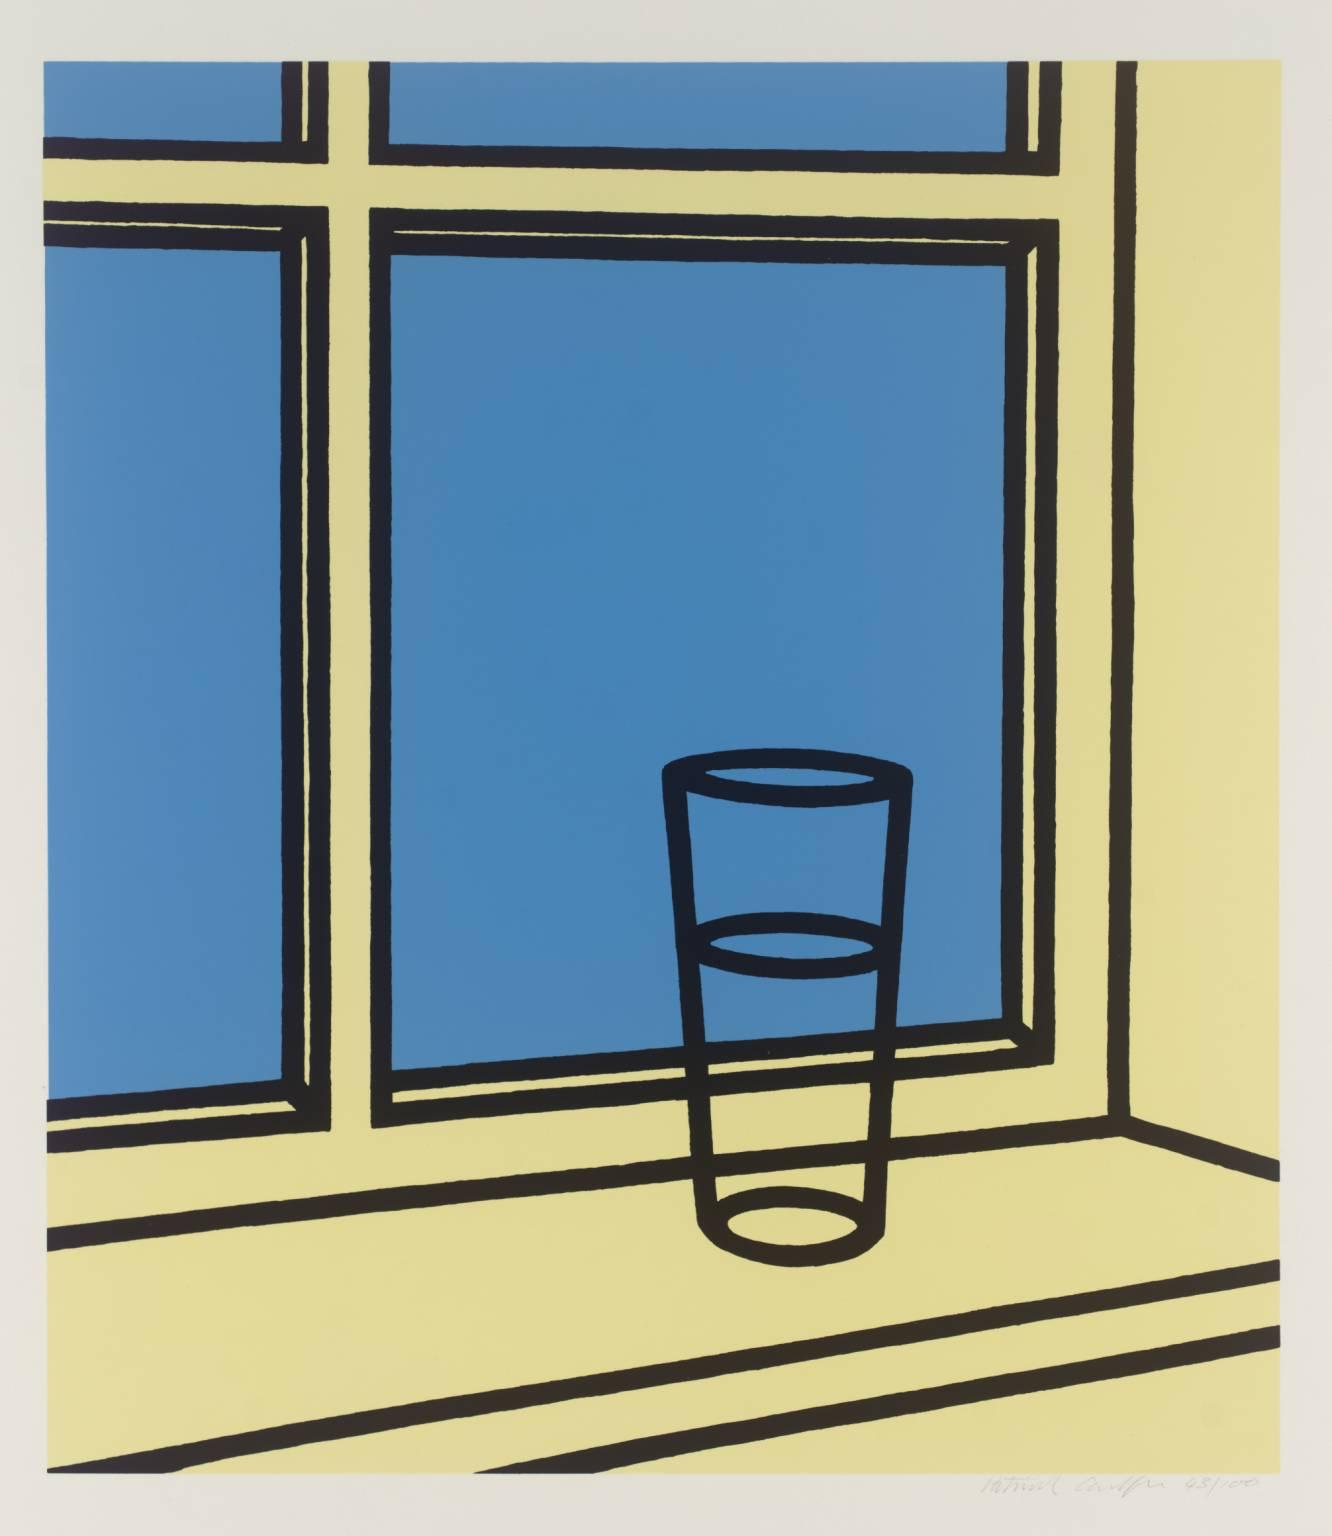 ART & ARTISTS: Patrick Caulfield - part 4